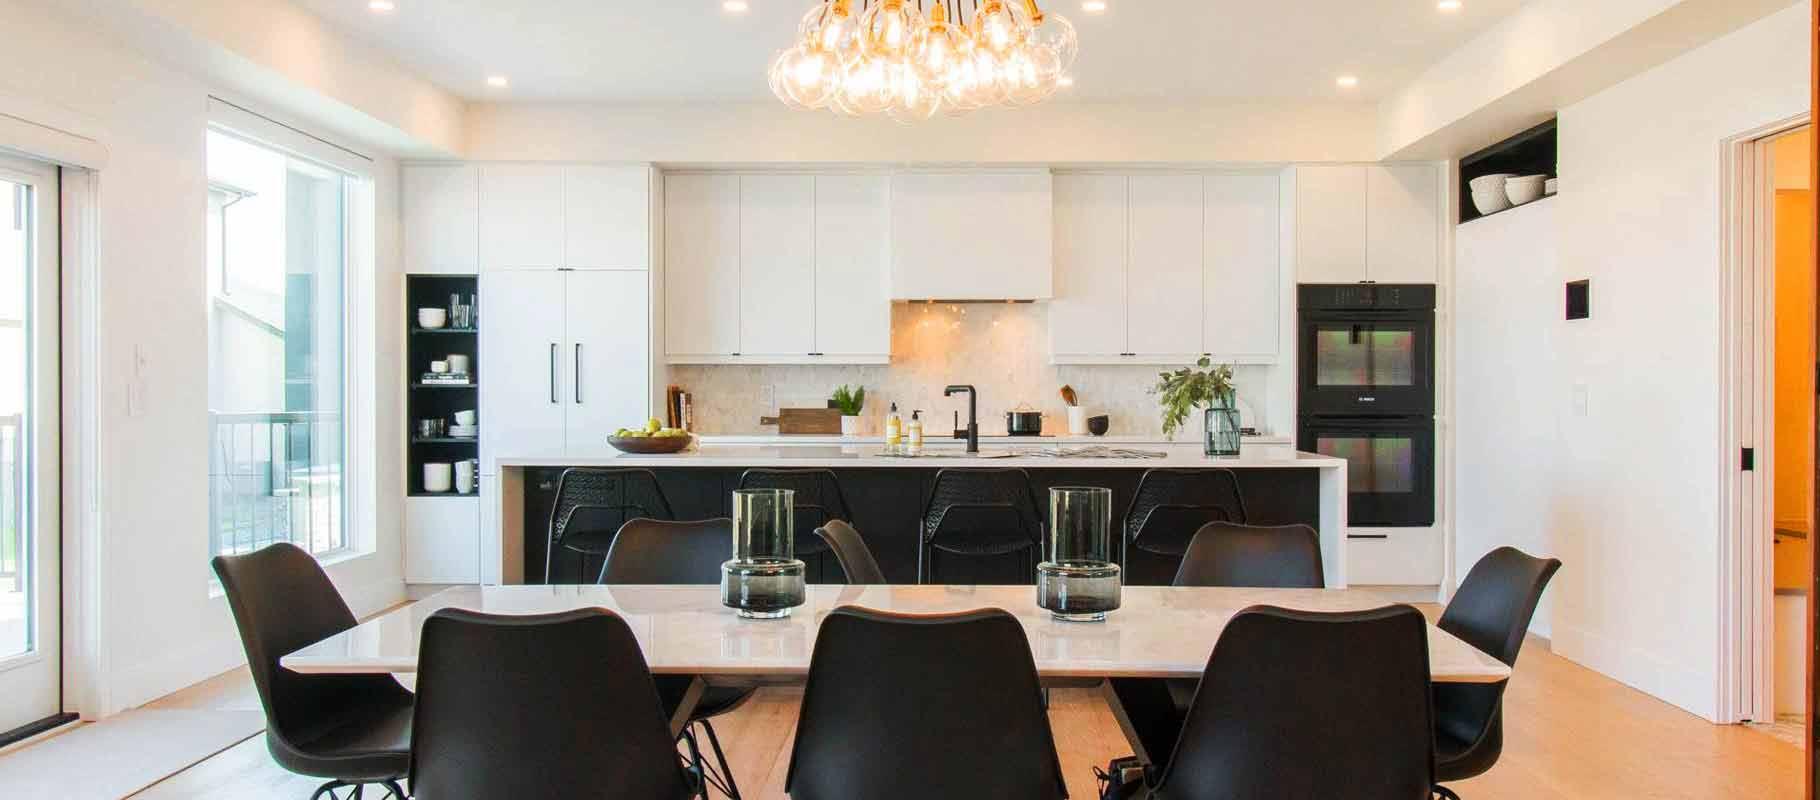 Delicieux Custom Cabinets Winnipeg | Best Woodworking Company Canada ...